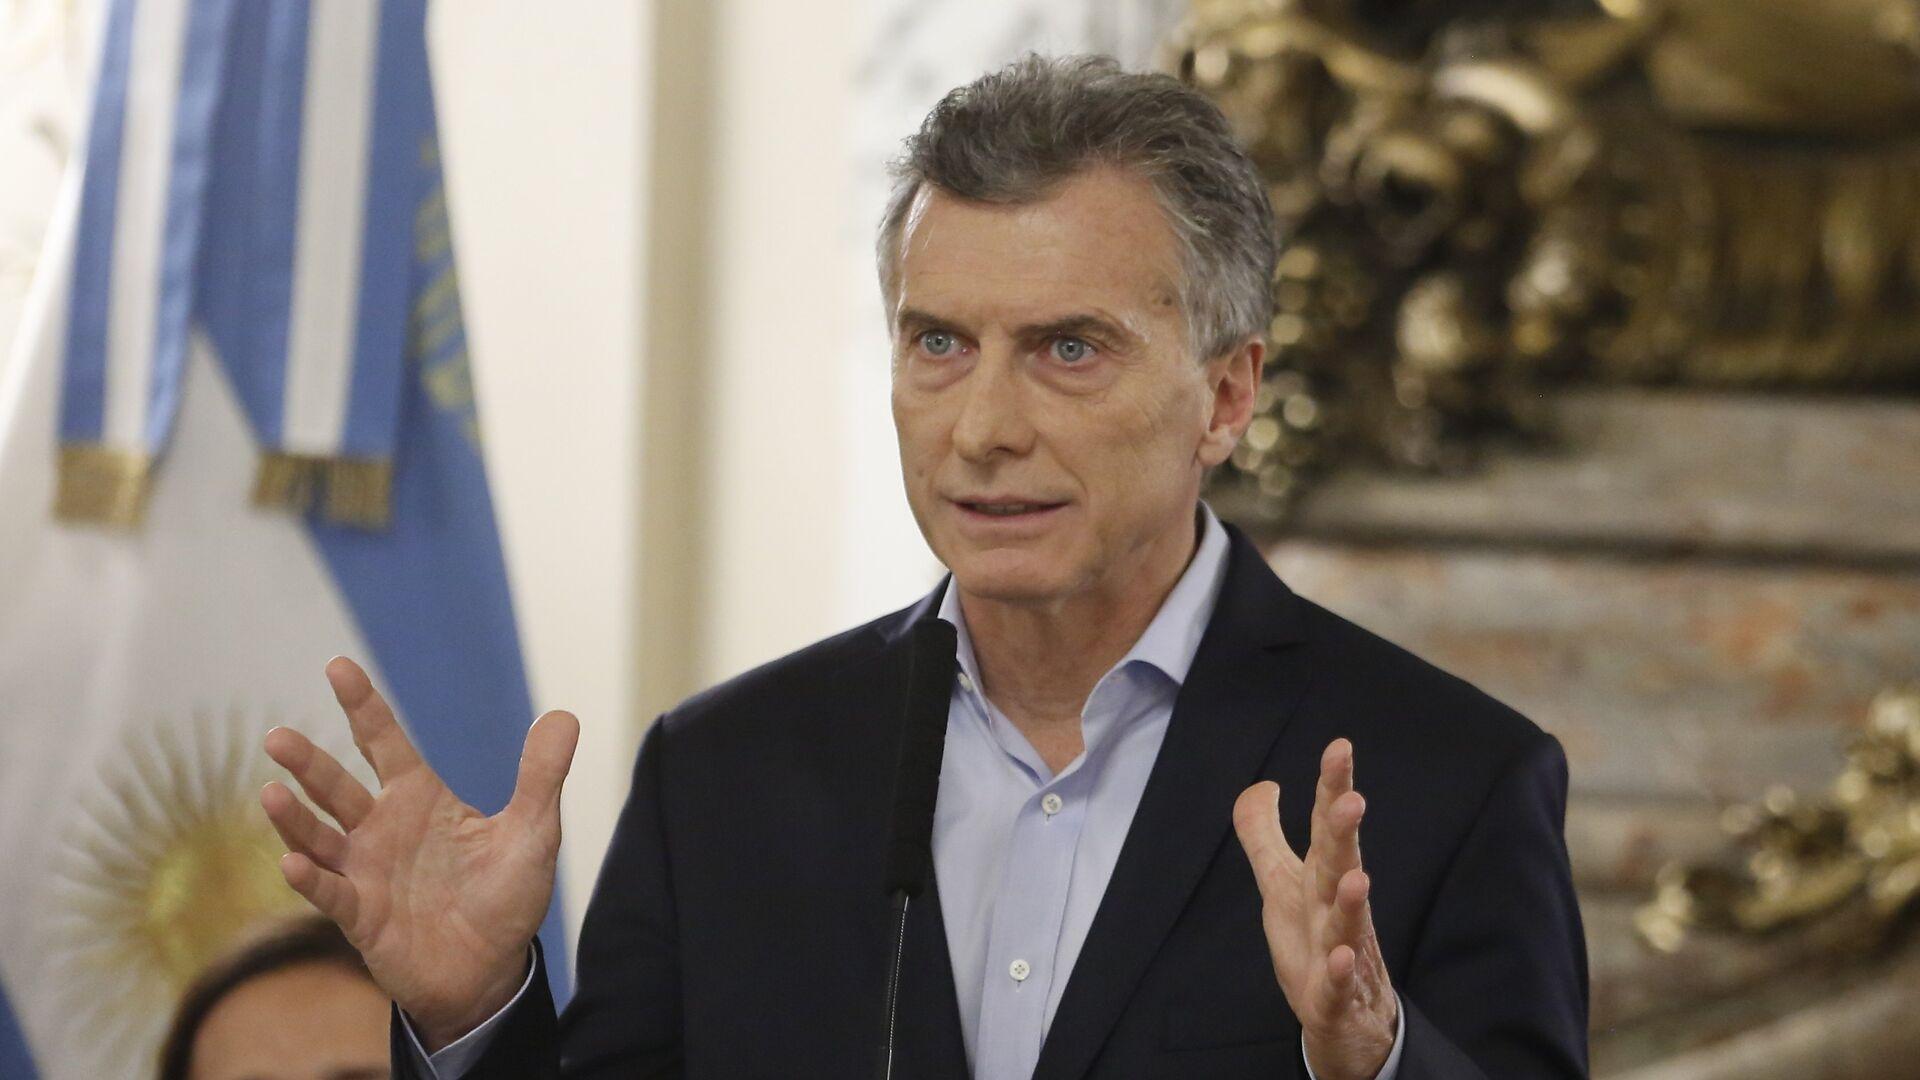 Mauricio Macri, presidente de Argentina - Sputnik Mundo, 1920, 22.07.2021